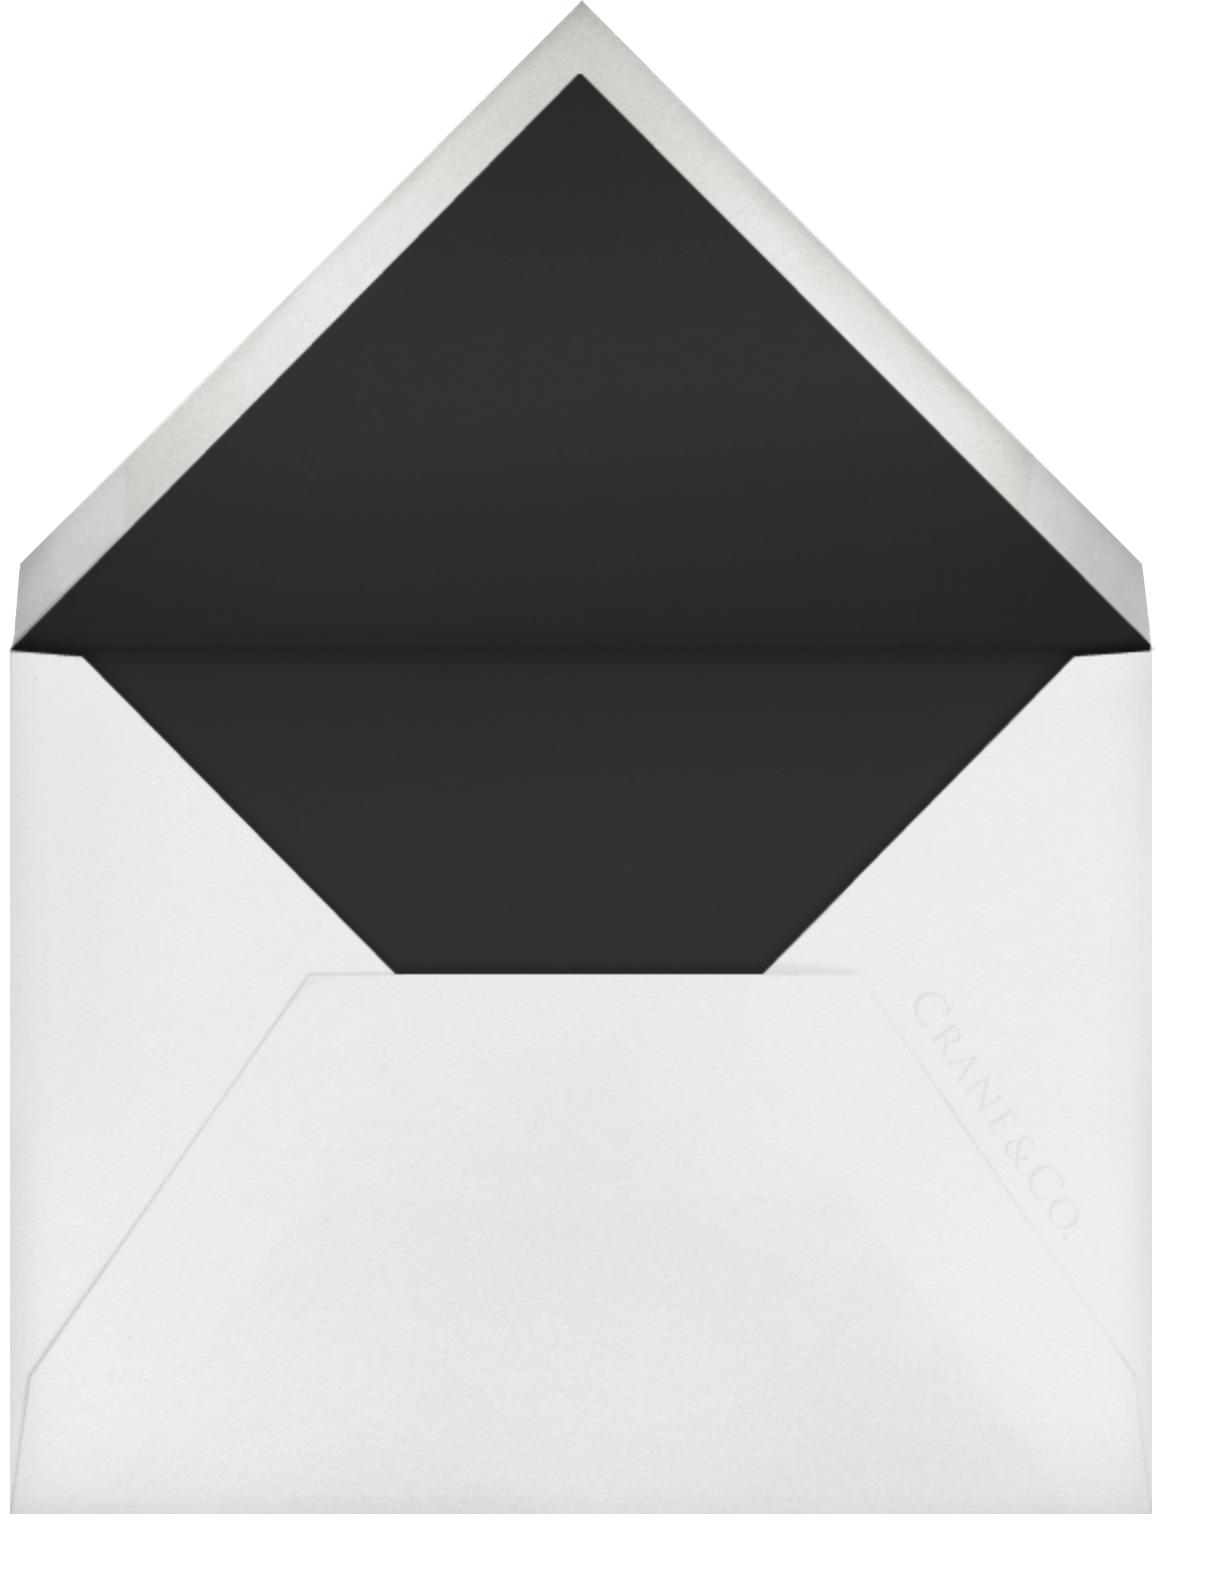 Polka Dot - Black - Oscar de la Renta - General entertaining - envelope back